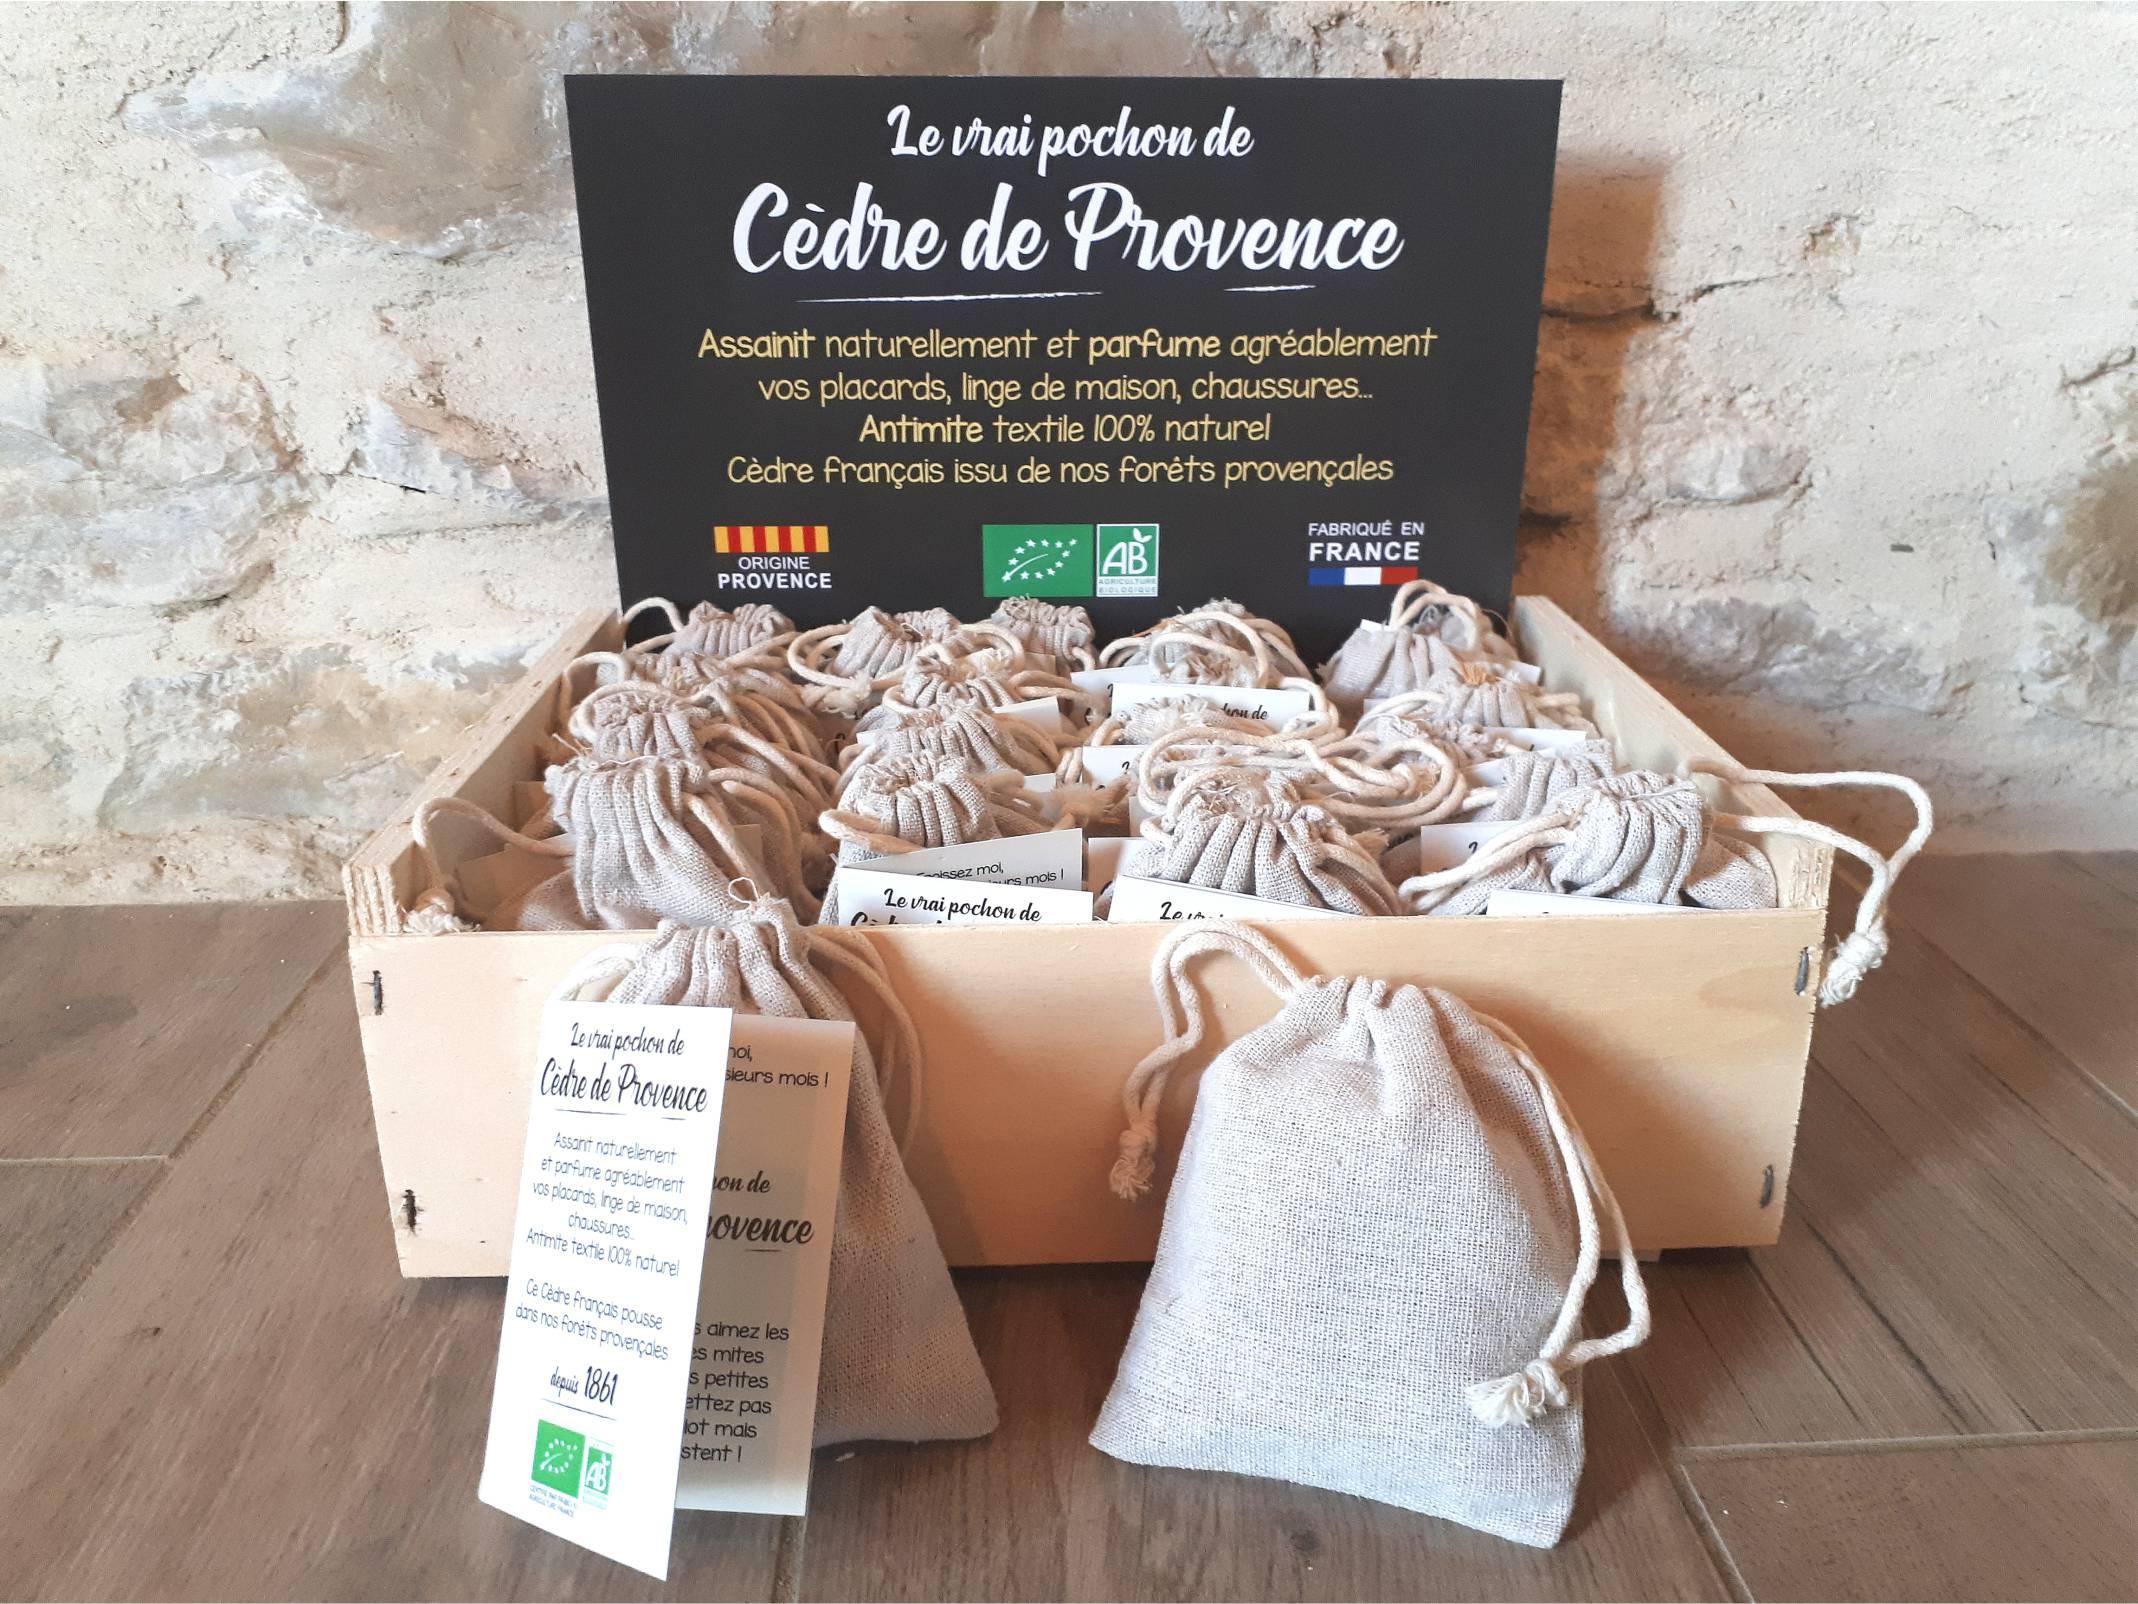 Pochons-cedre-coeur-dabeille